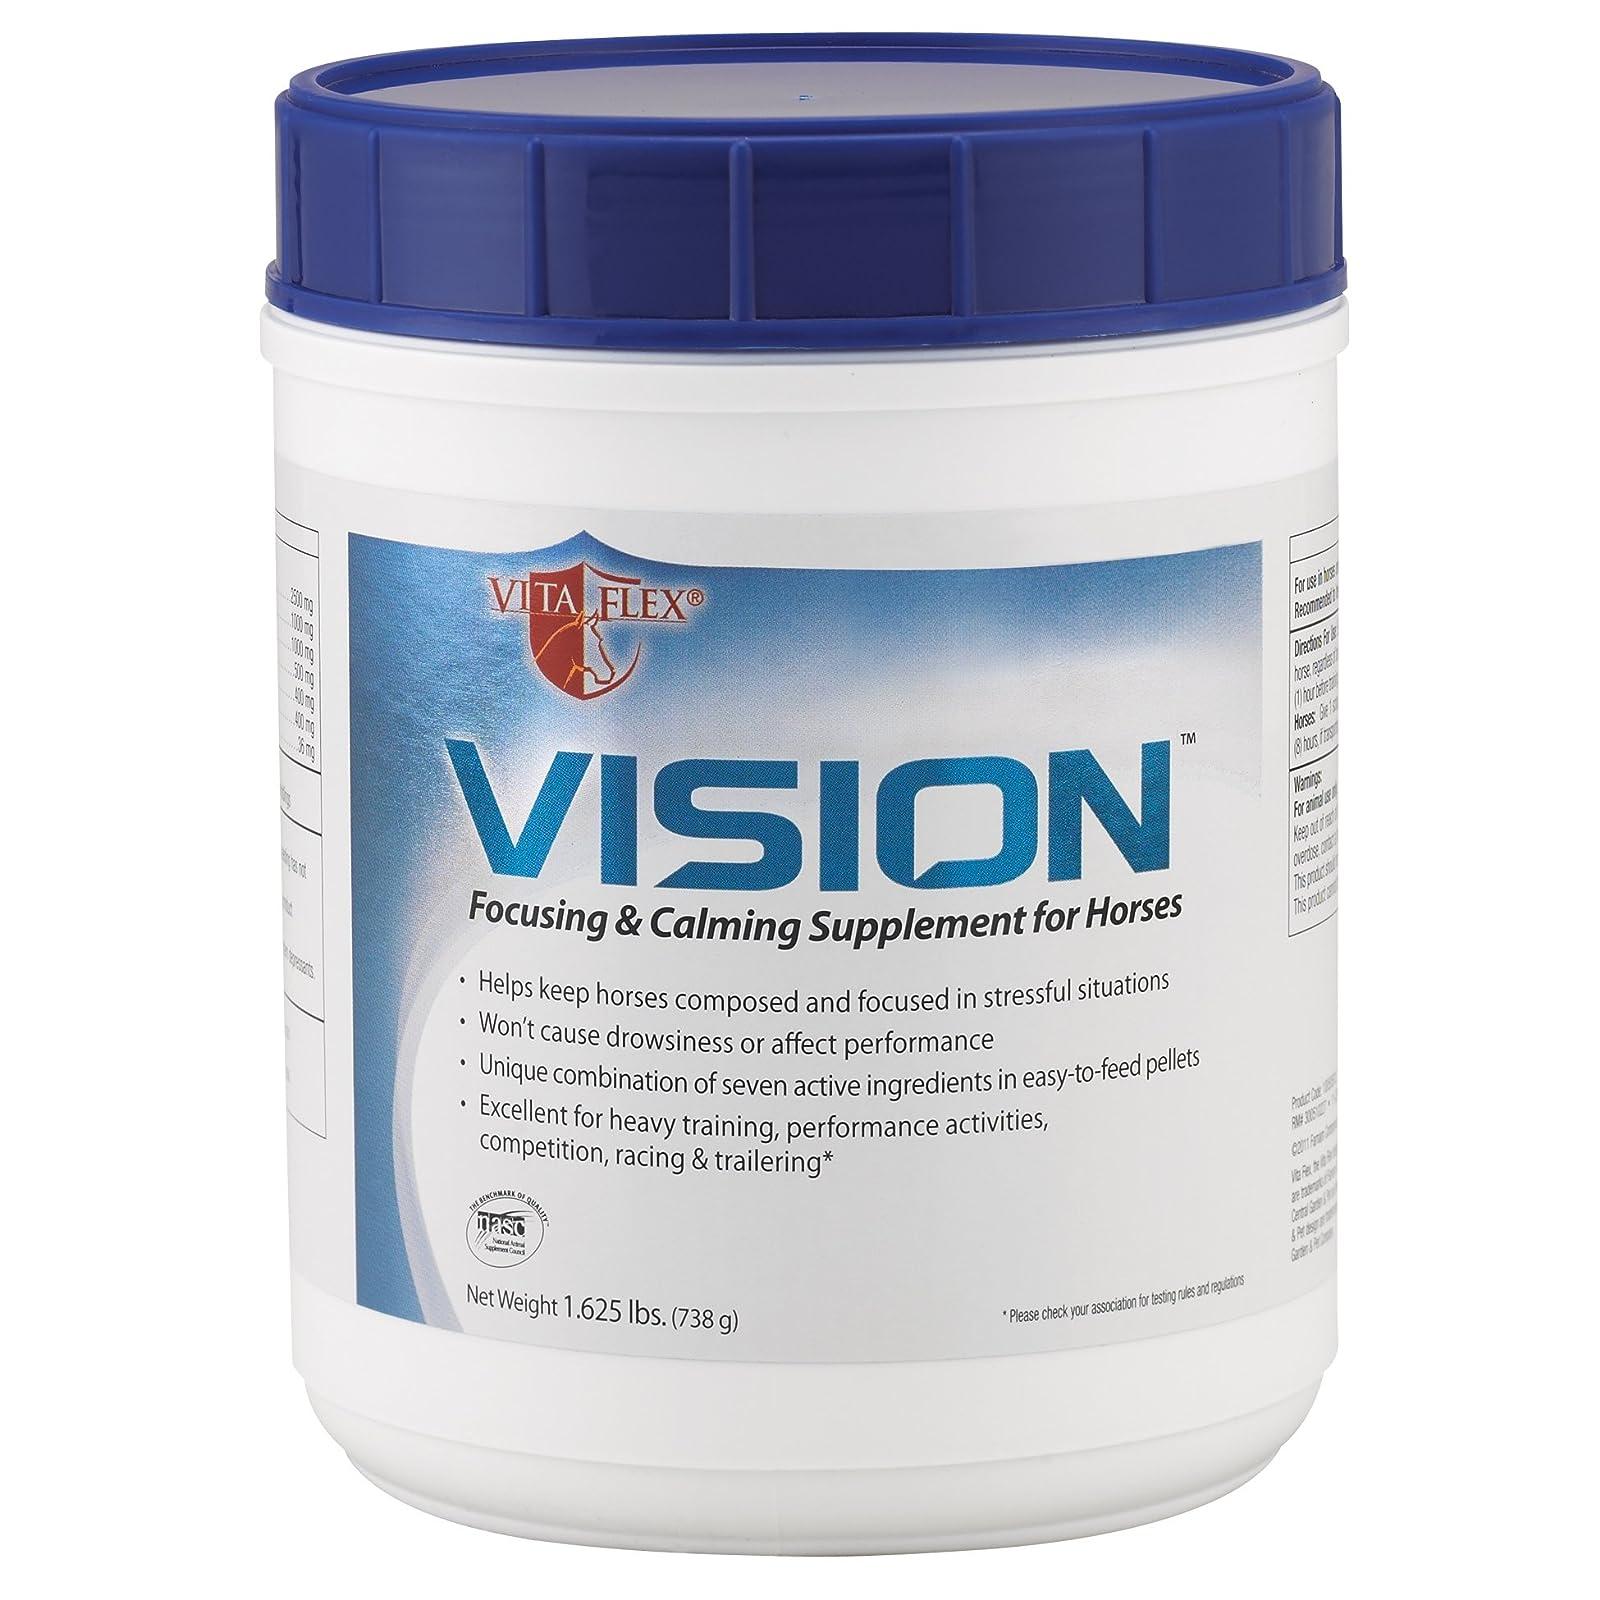 Vita Flex Vision Focusing & Calming SupplementHorses Pellets 100505812 - 1